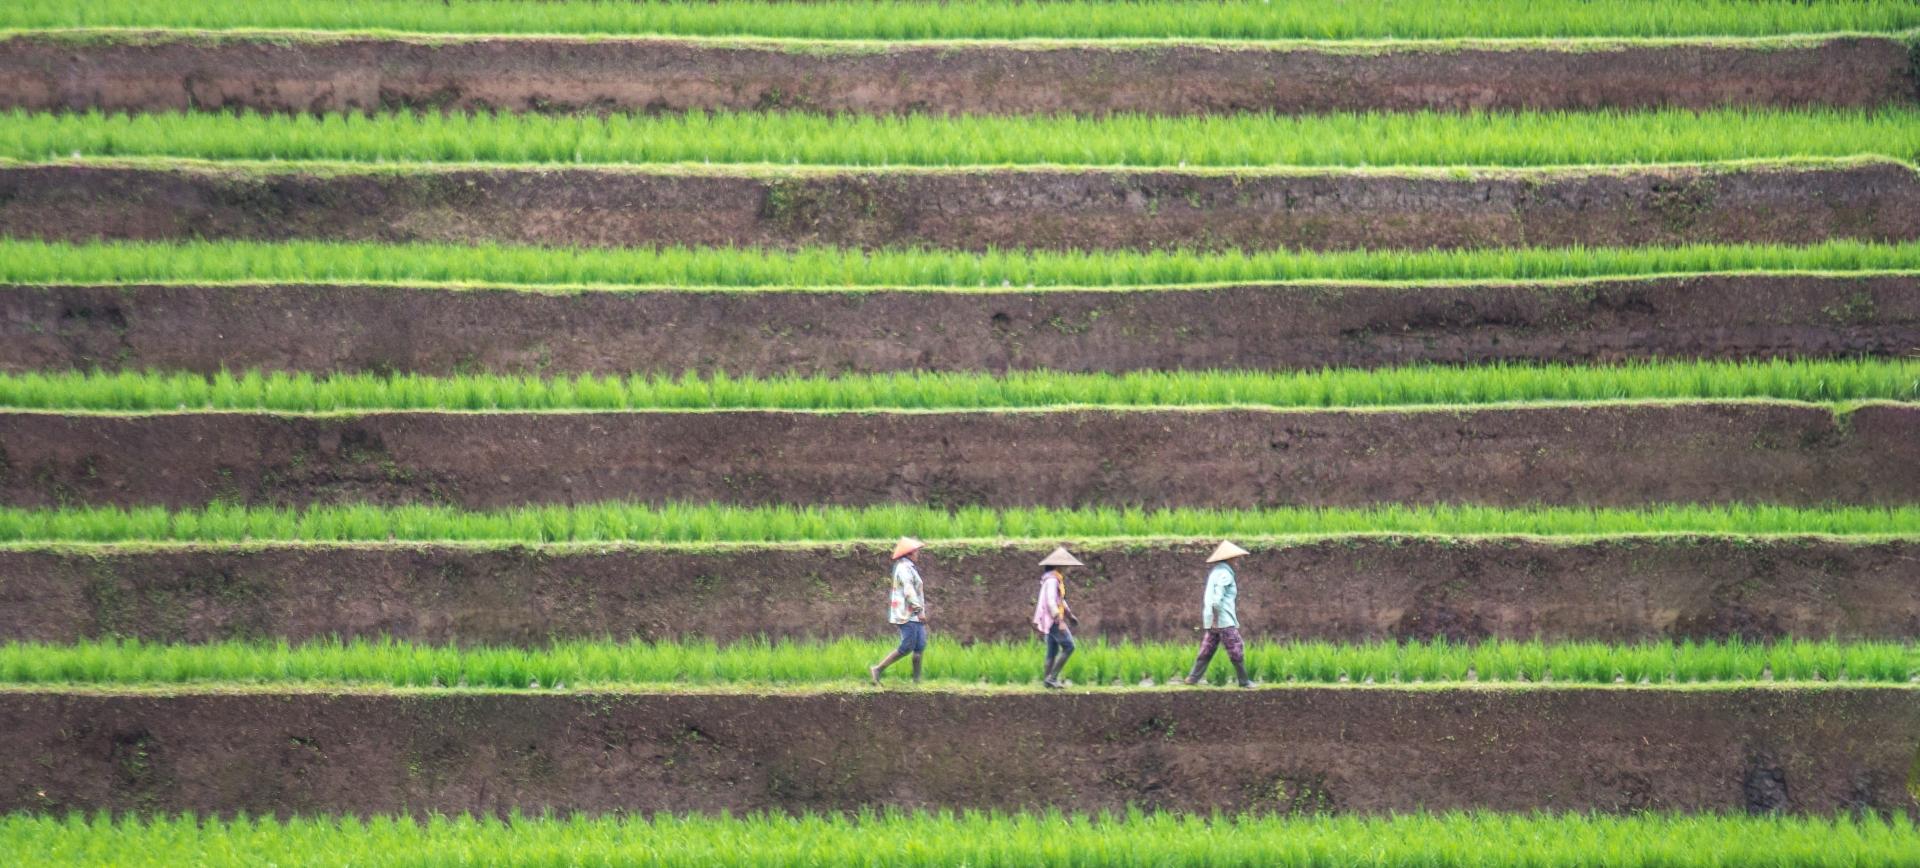 Custom-Travel-Planner-Network-Beautiful-Bali-Rice-Farmers